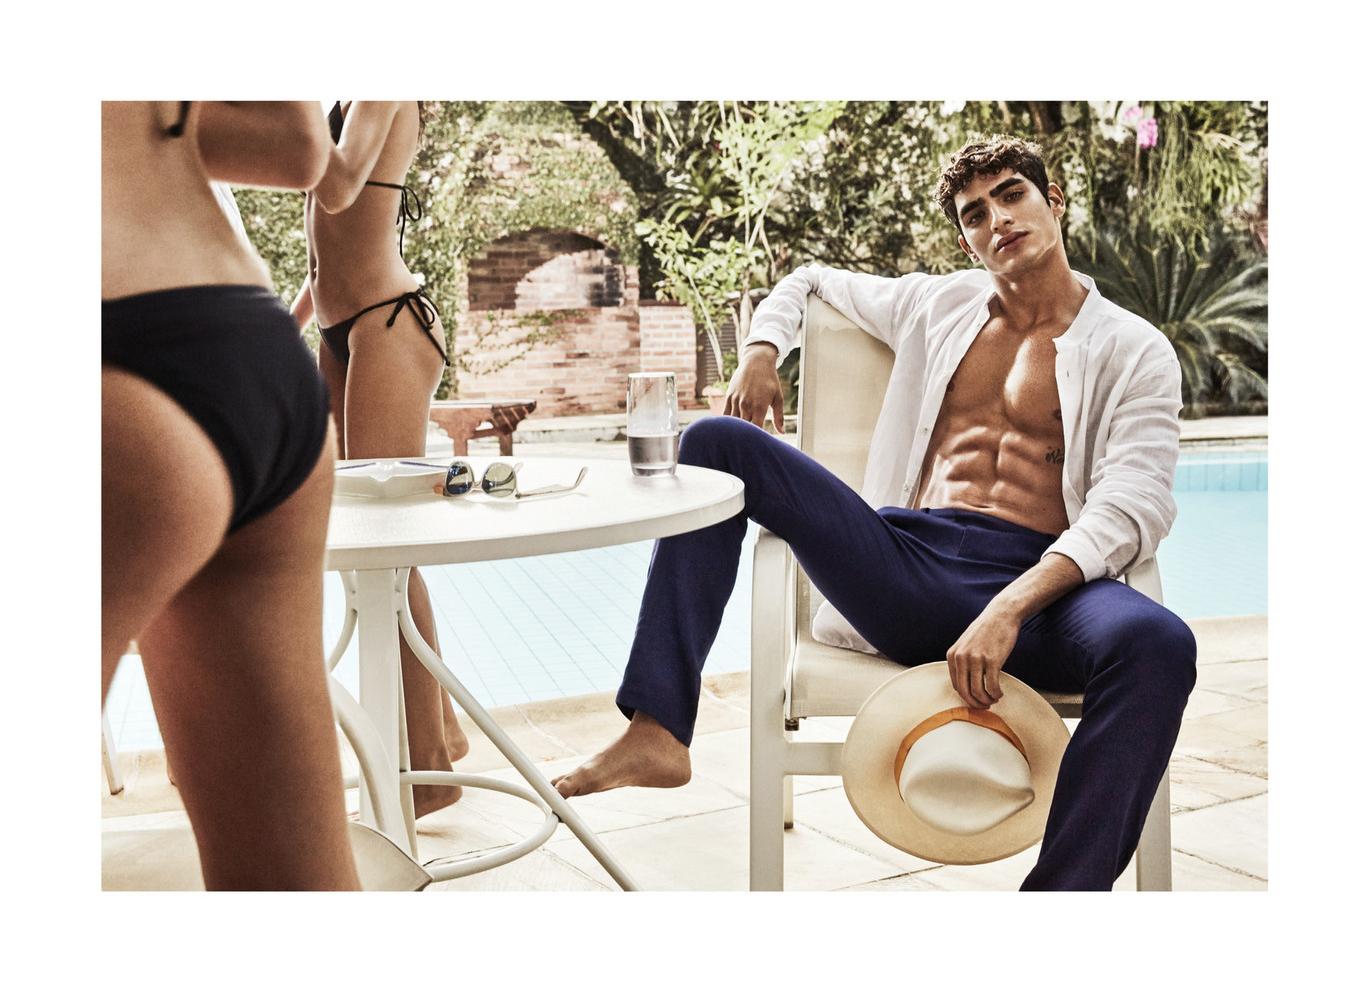 Jhonattan Burjack and Savane Gonzalez by Alex Bramall x Carioca Post